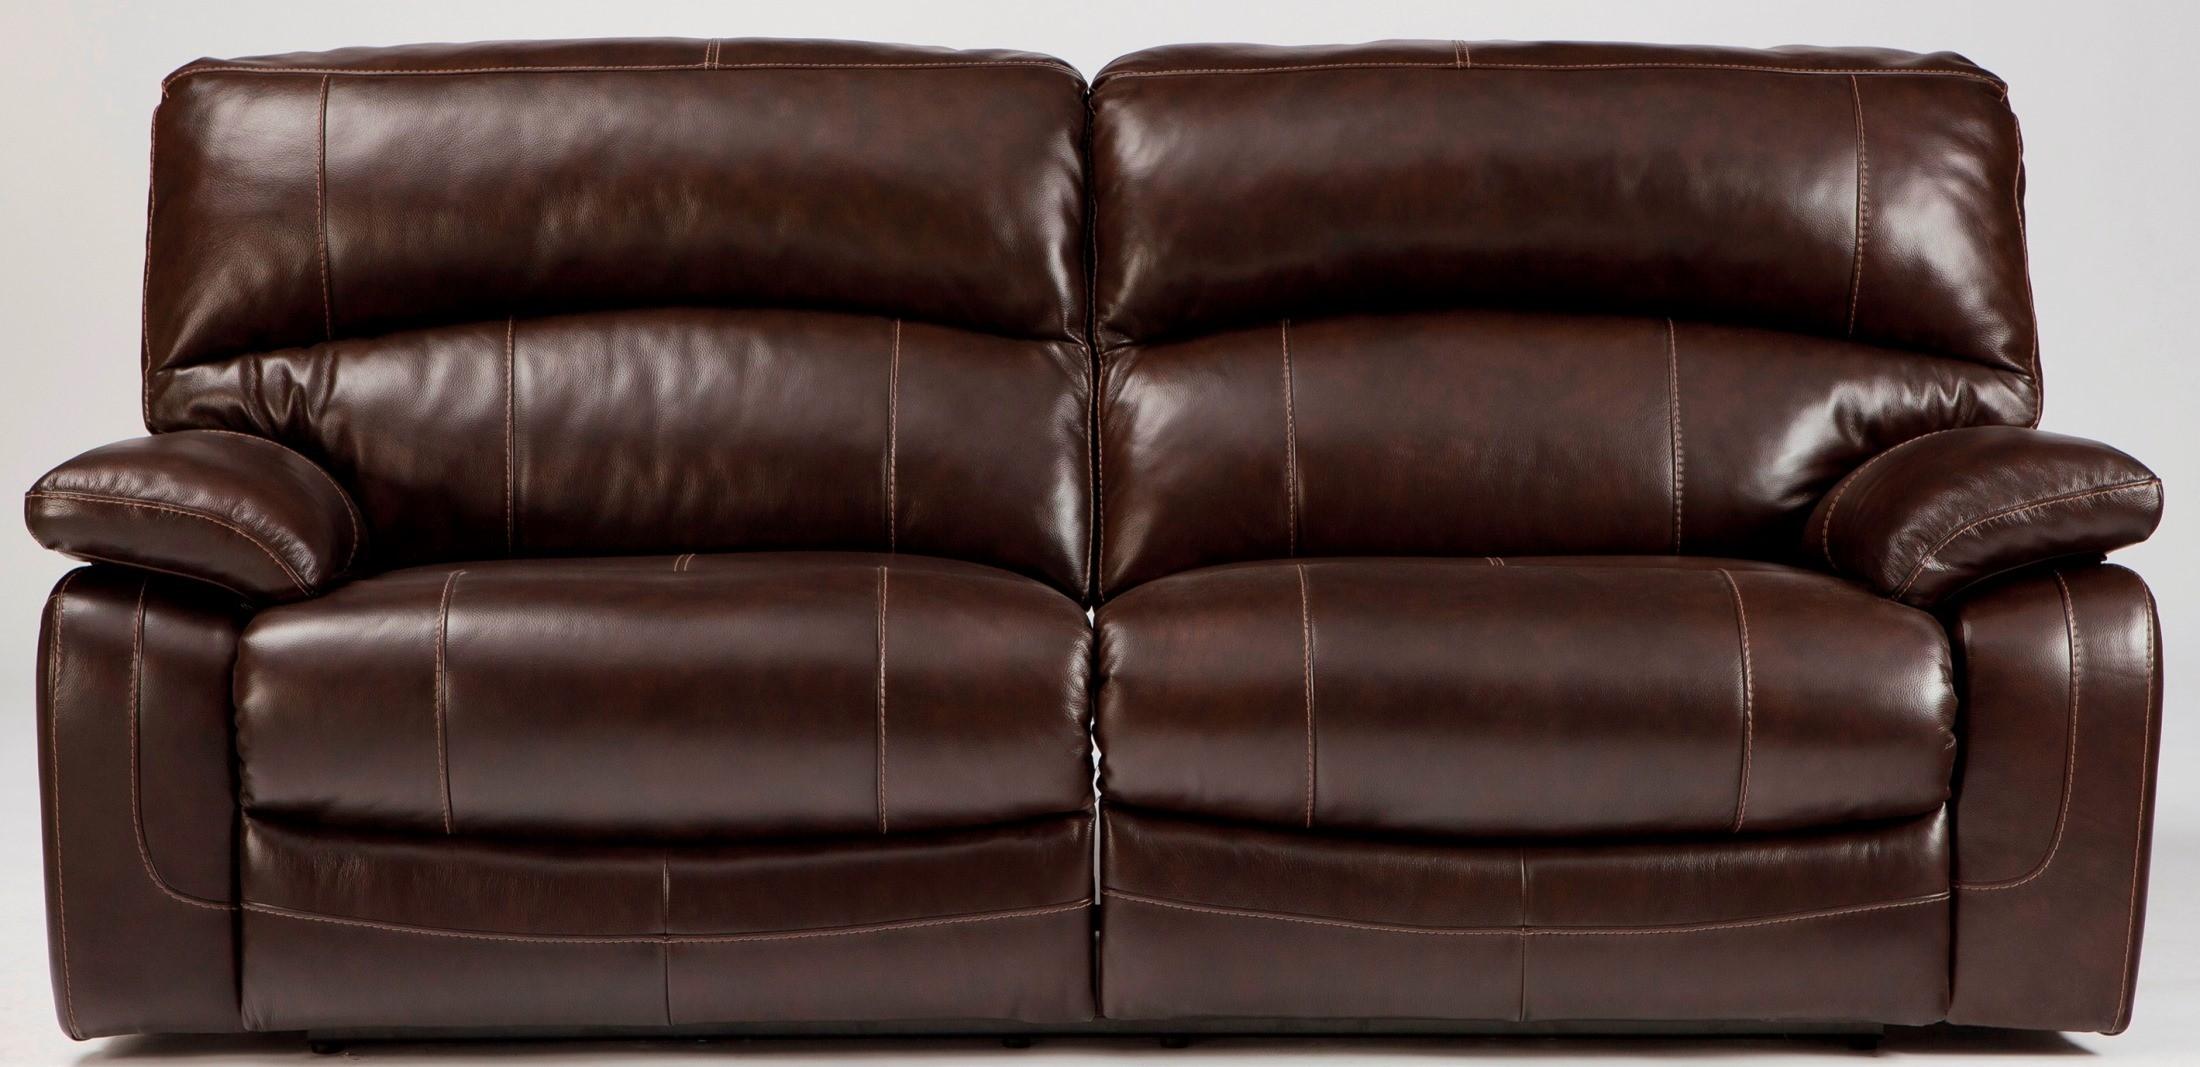 Damacio Dark Brown Power Reclining Living Room Set From